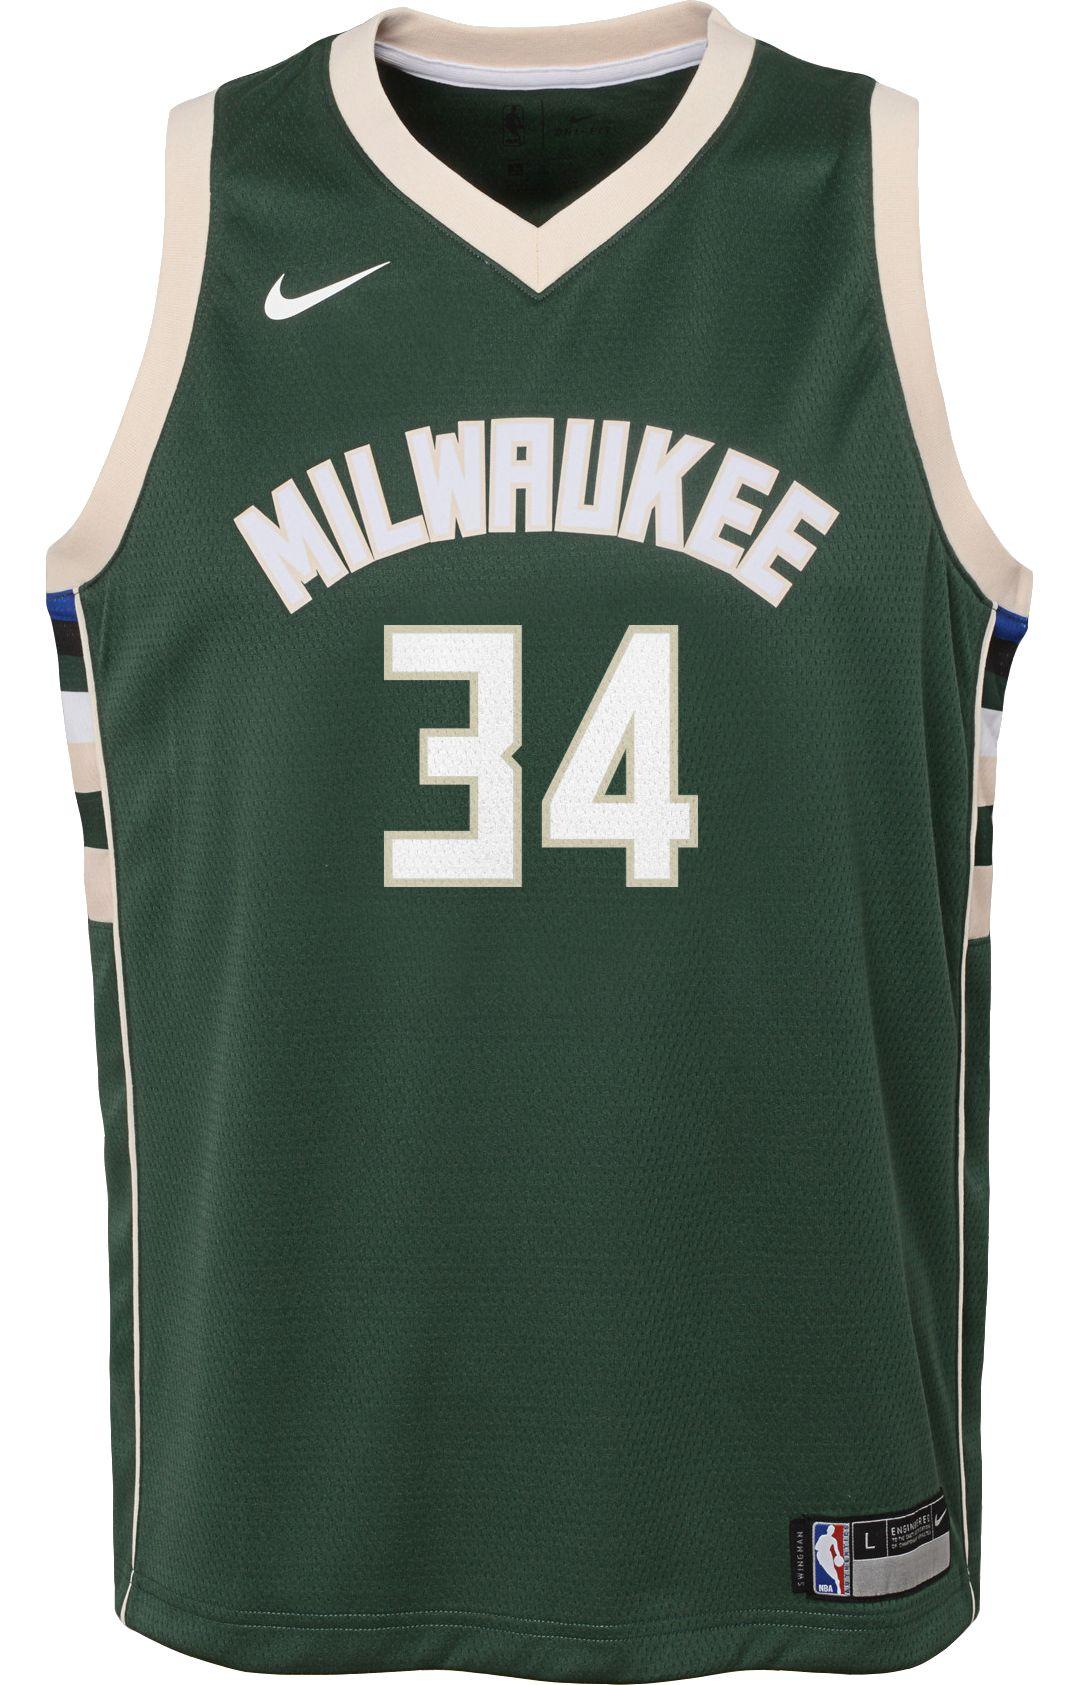 5c7d0eadf26 Nike Youth Milwaukee Bucks Giannis Antetokounmpo #34 Green Dri-FIT Swingman  Jersey 2